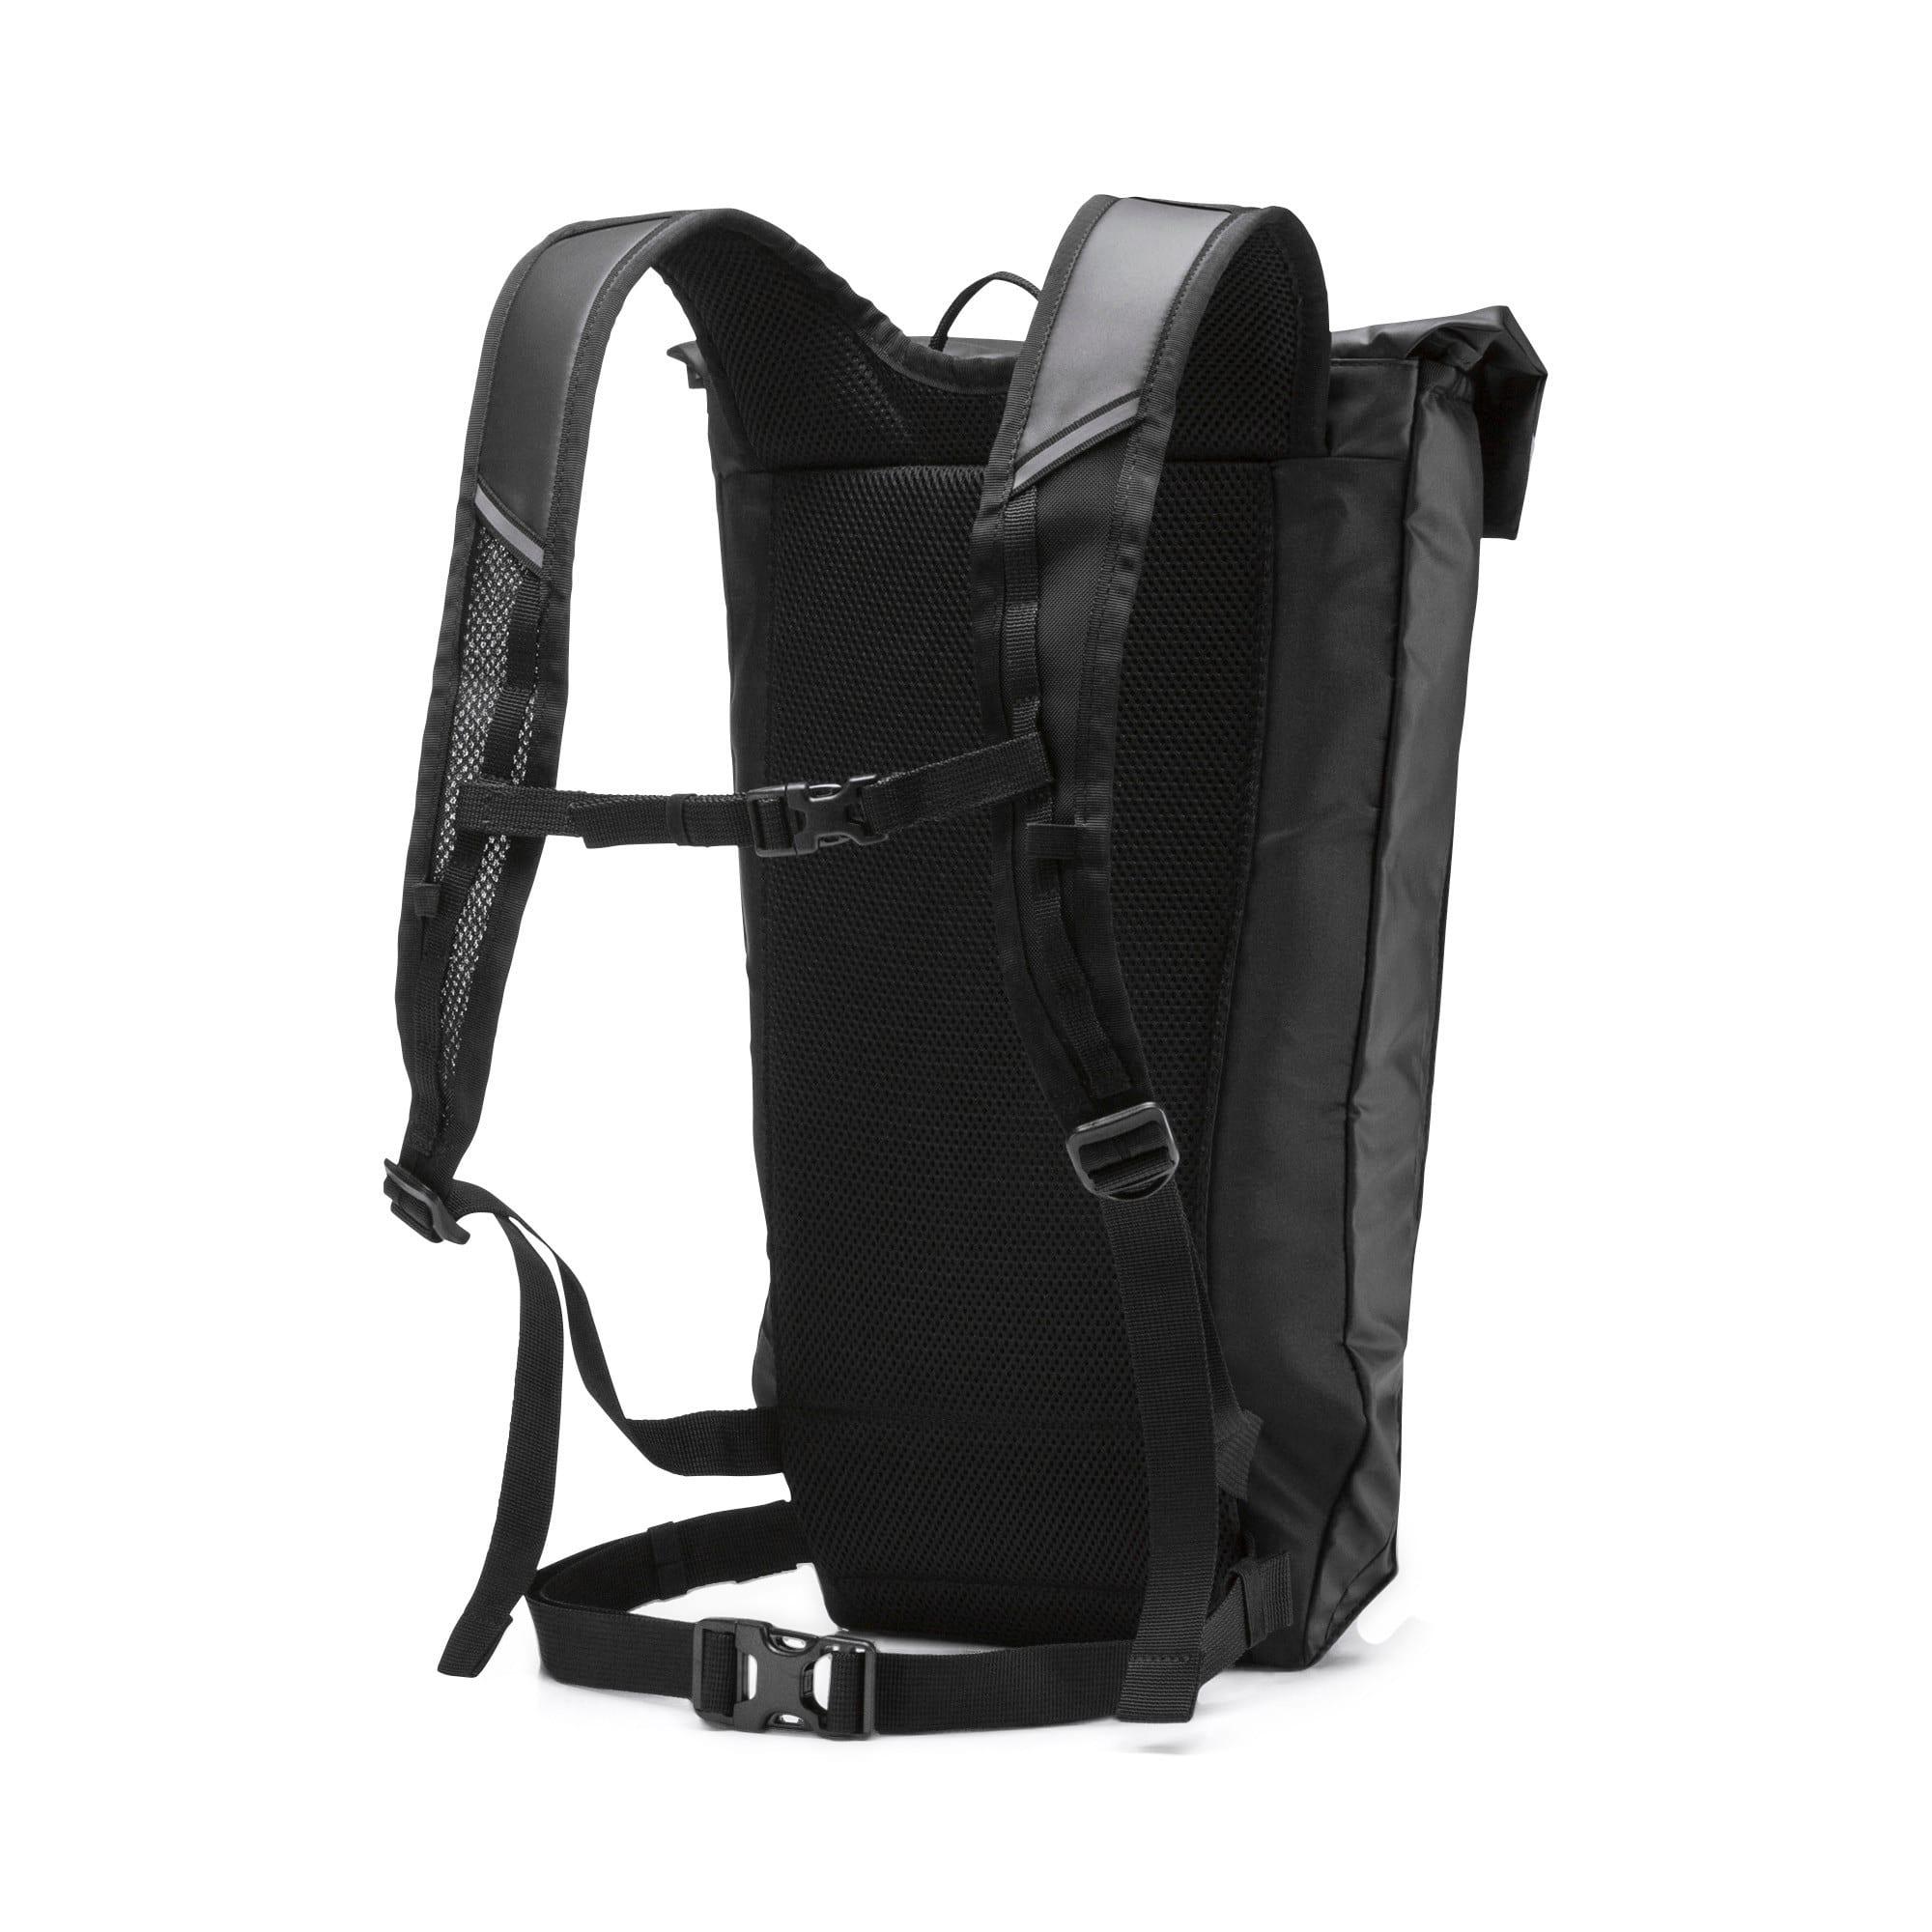 Thumbnail 3 of Street Running Backpack, Puma Black, medium